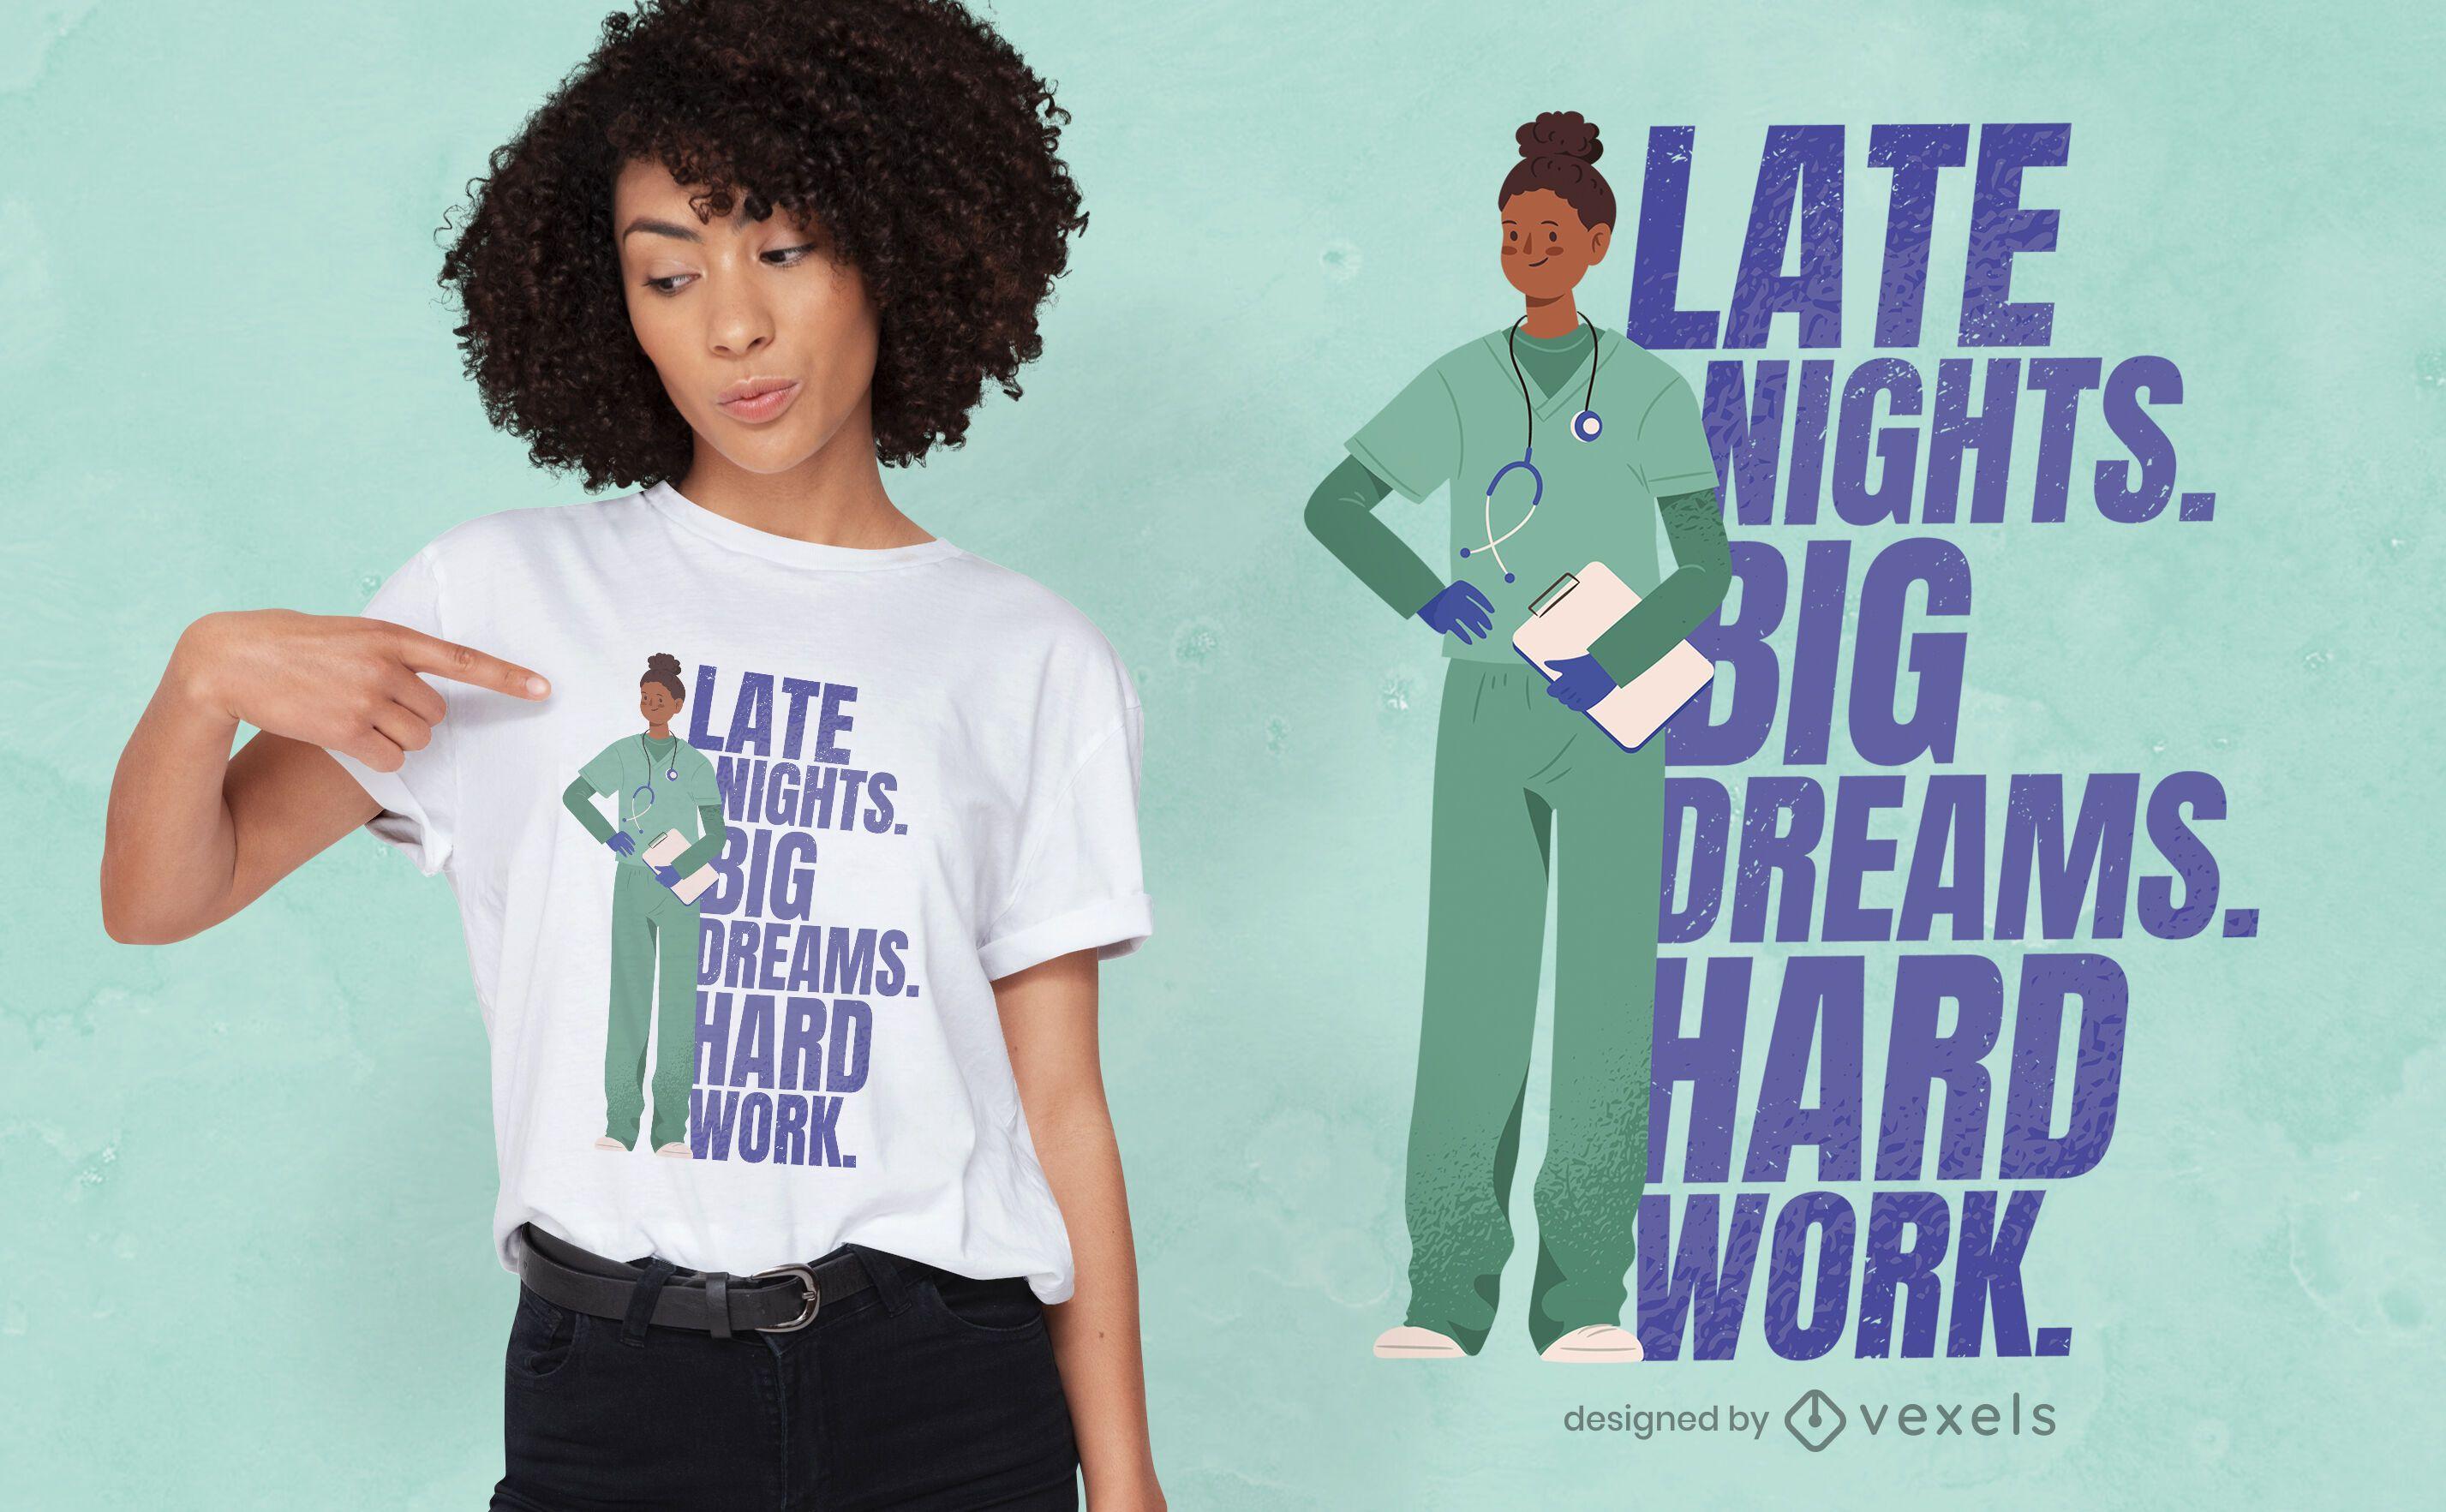 Nurse job hard work quote t-shirt design